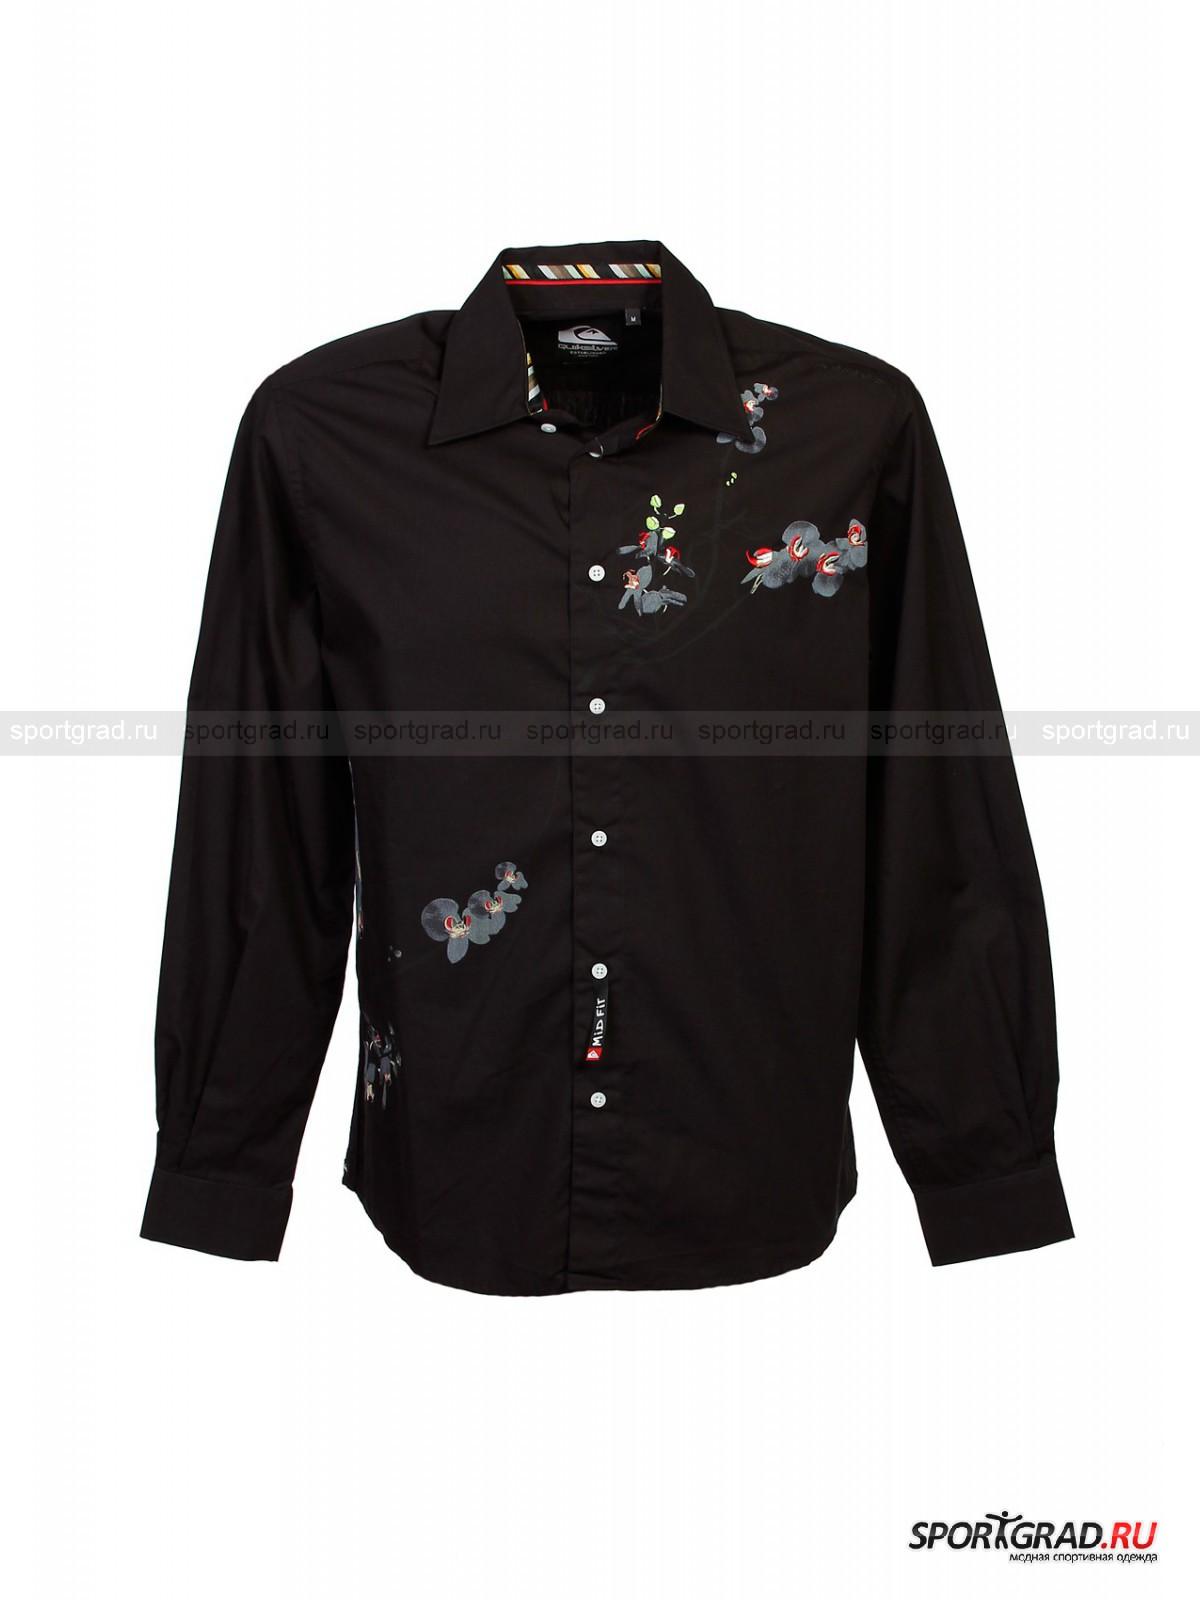 Рубашка мужская AIRBRUSH QUIKSILVER